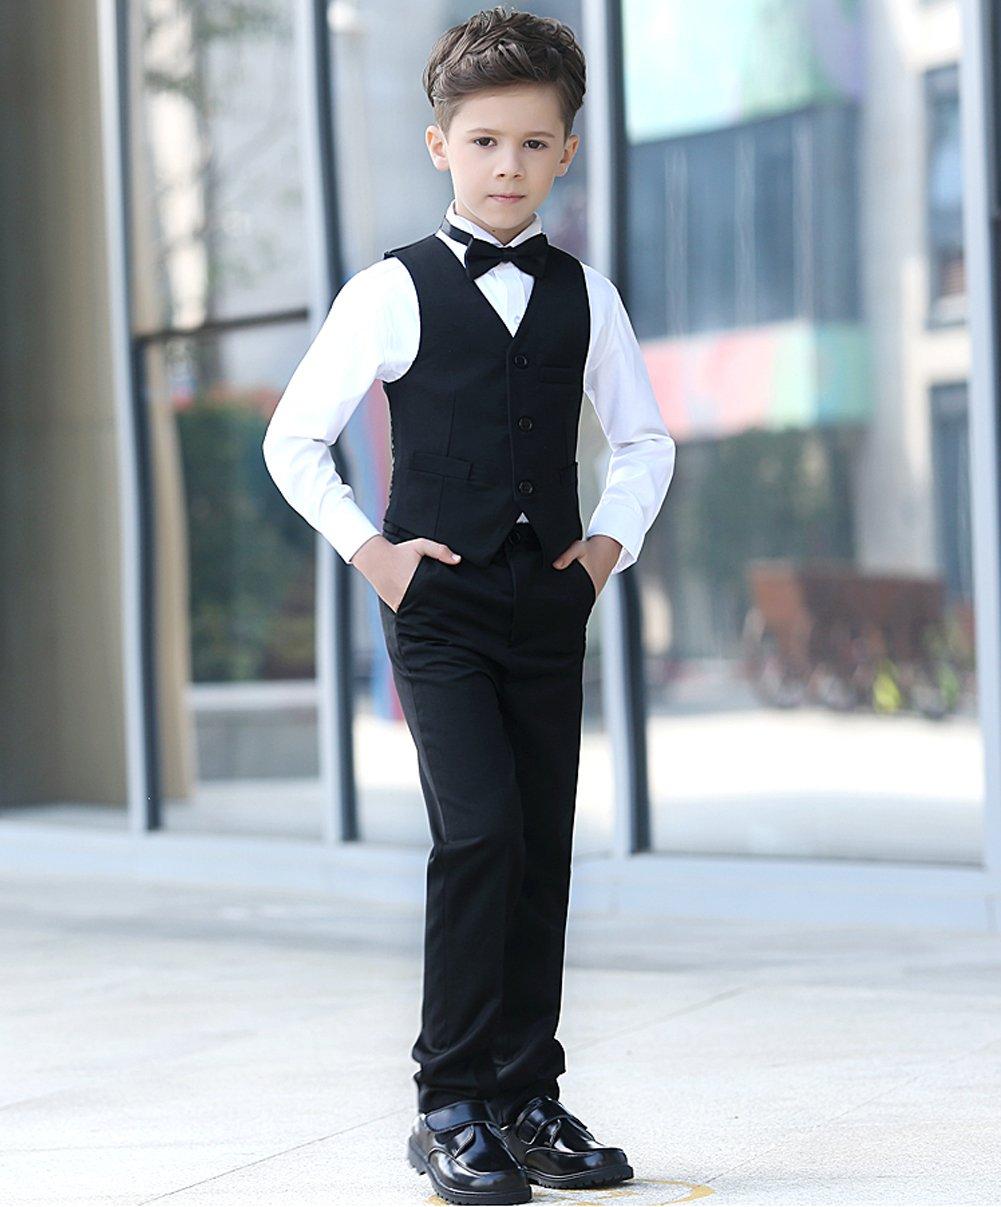 YuanLu Boys Colorful Formal Suits 5 Piece Slim Fit Dresswear Suit Set (Black, 14) by YuanLu (Image #2)